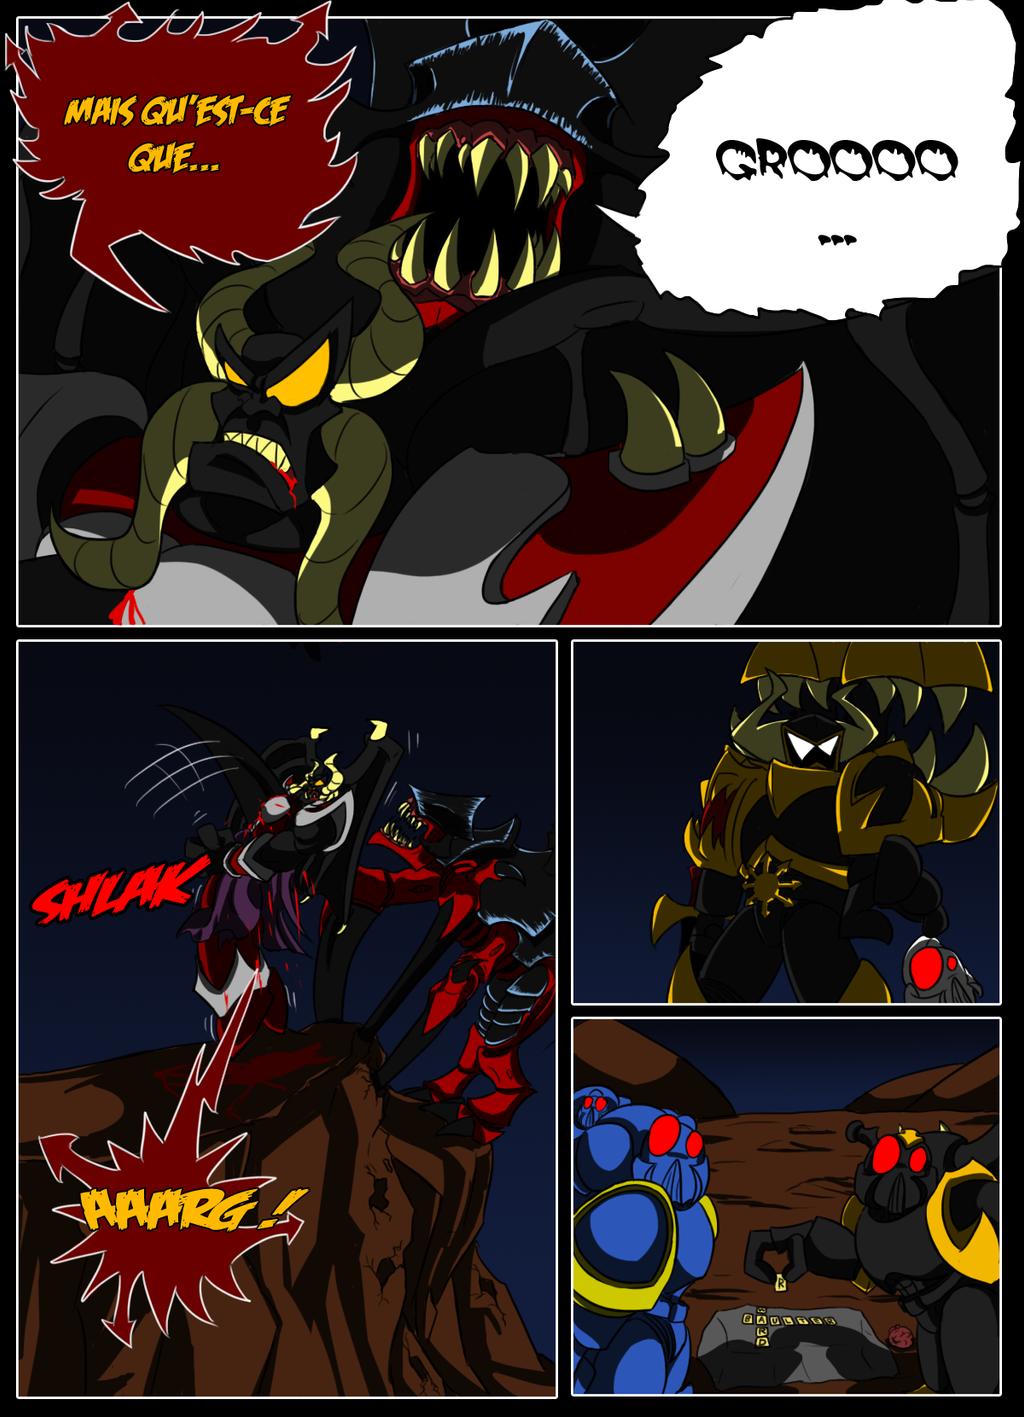 Bandes Dessinées de Warhammer 40,000 - Page 2 P45__color_by_littlecutter-d5y96si